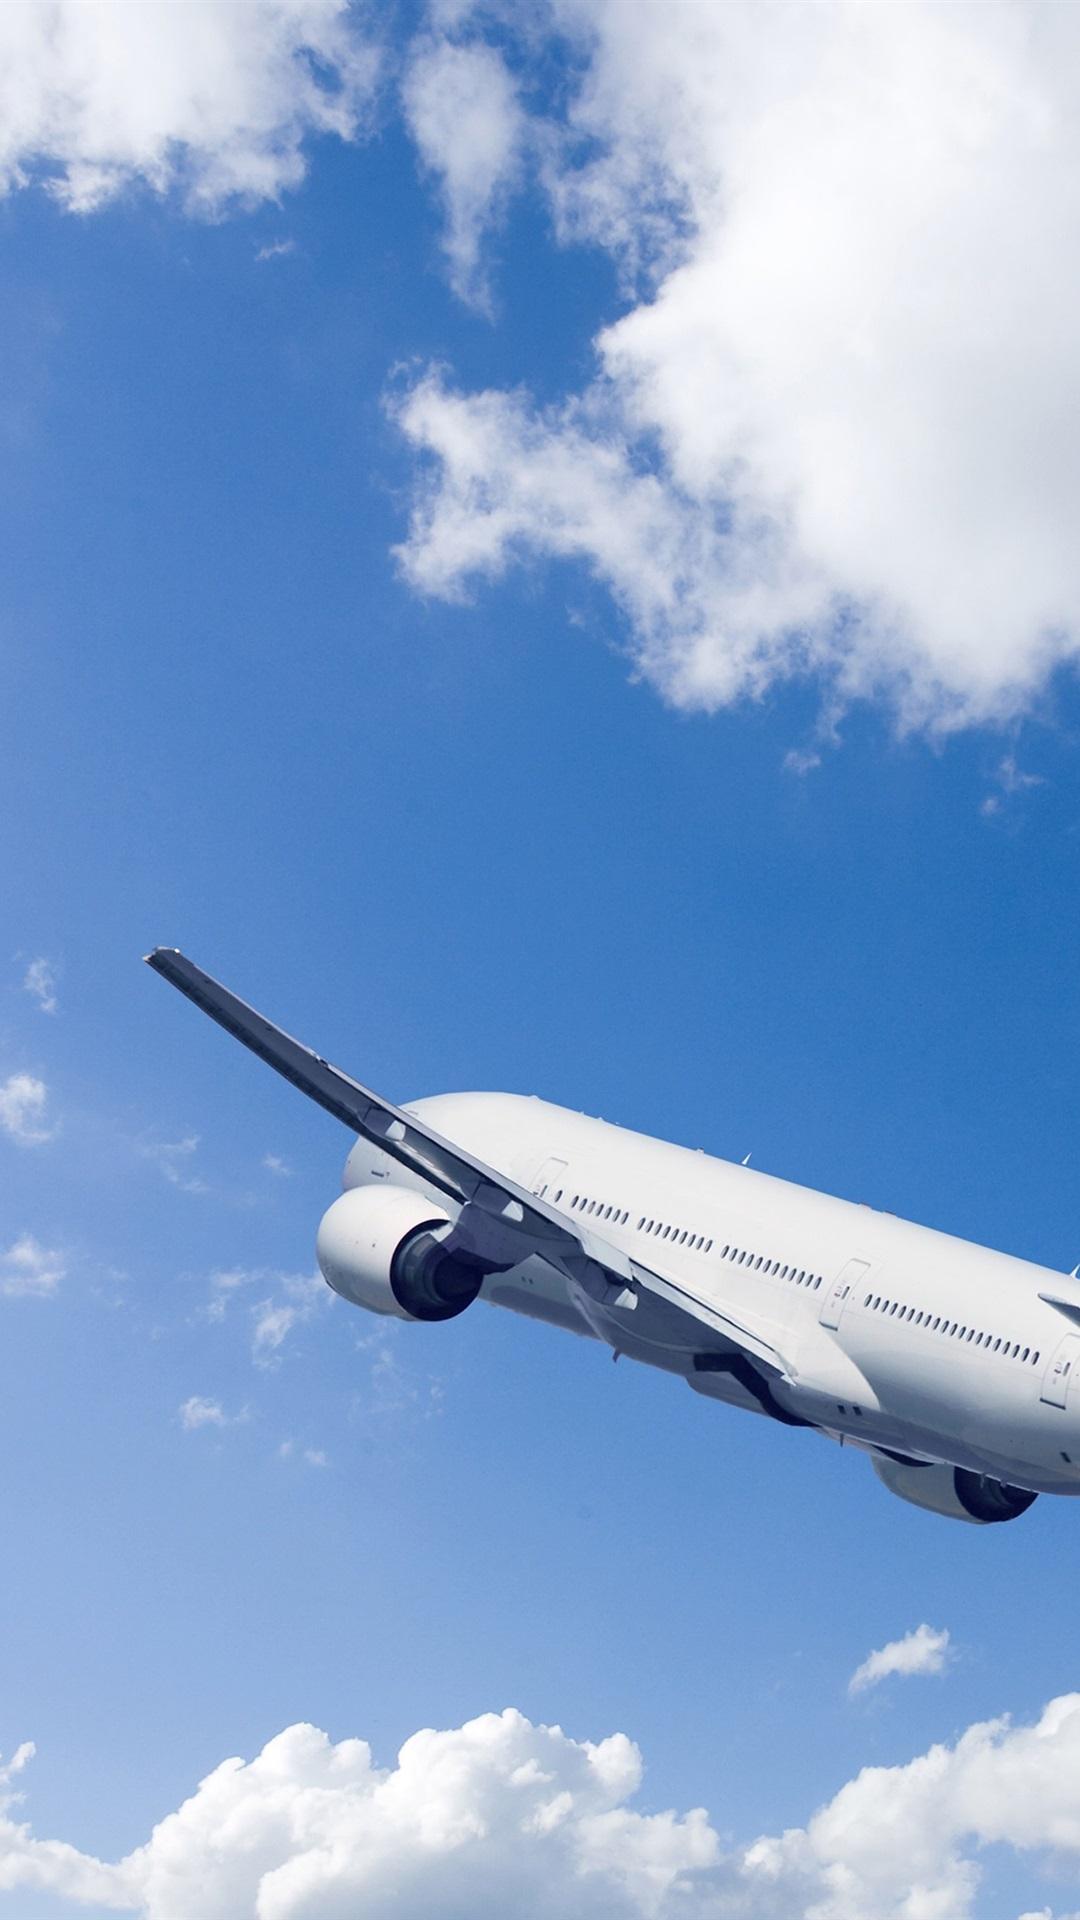 Passenger Airplane Rise Flight Blue Sky Clouds 1080x1920